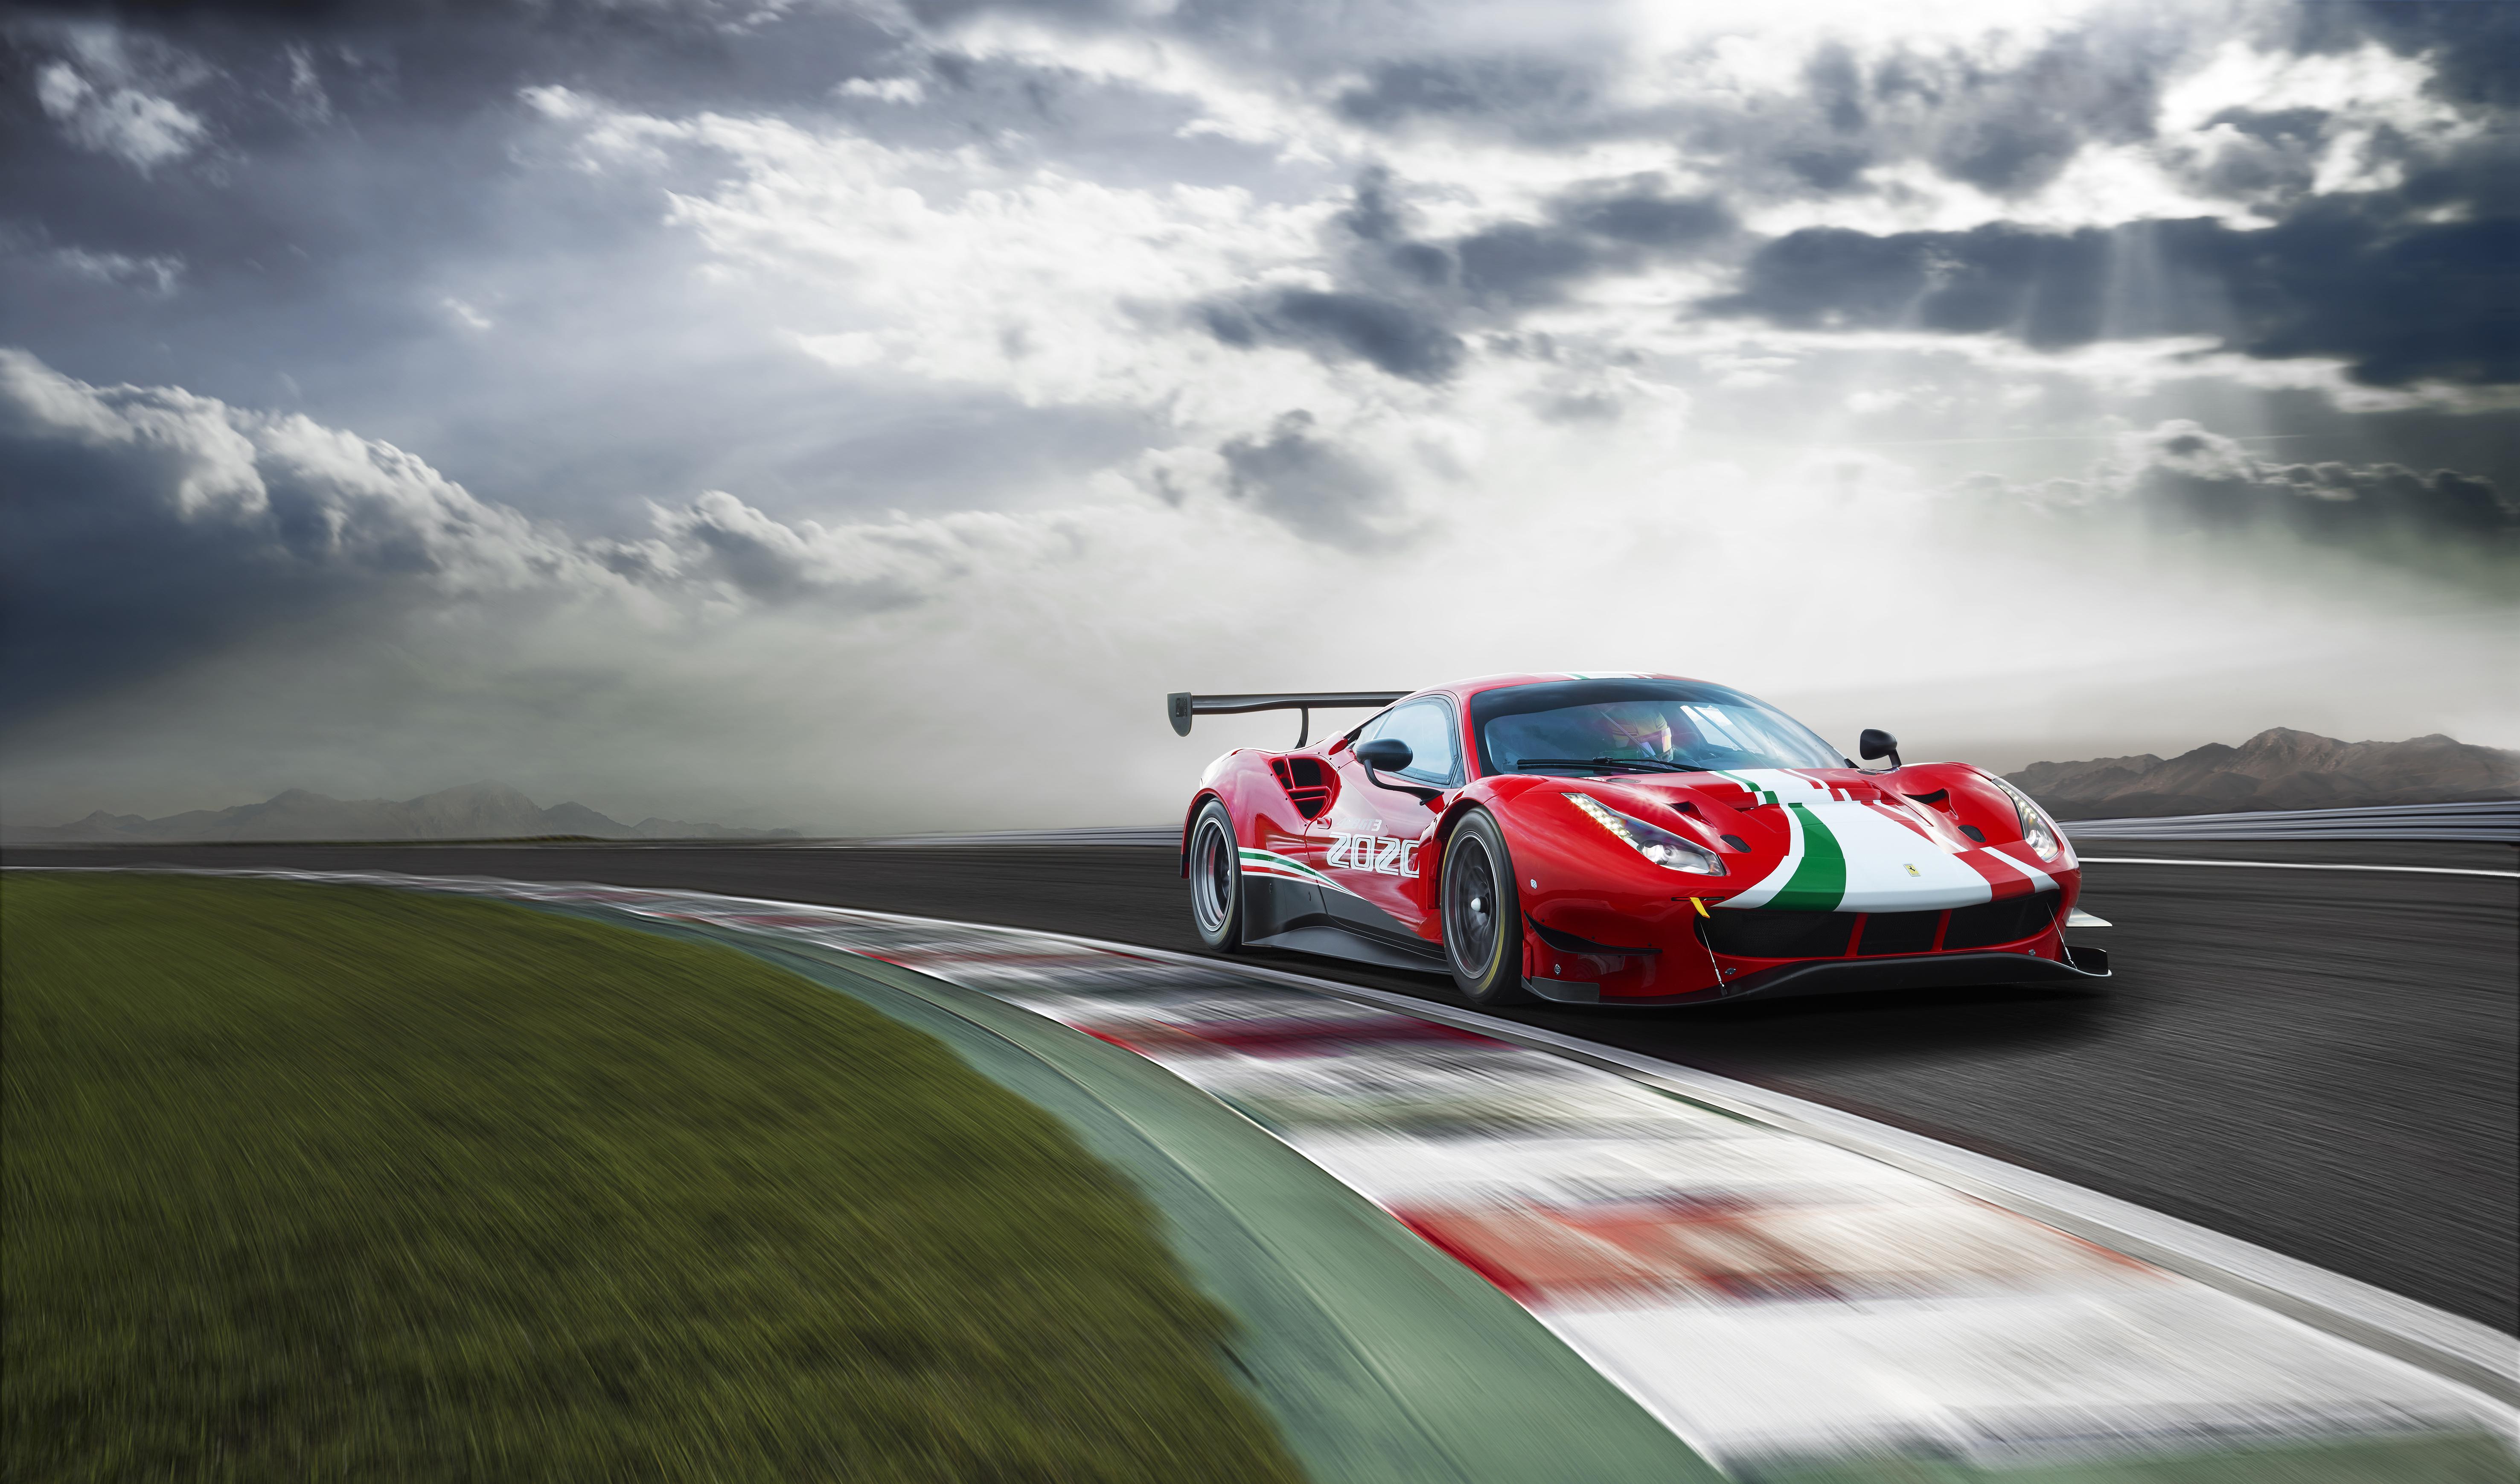 ferrari 488 gt3 evo 2020 1574936020 - Ferrari 488 GT3 Evo 2020 -